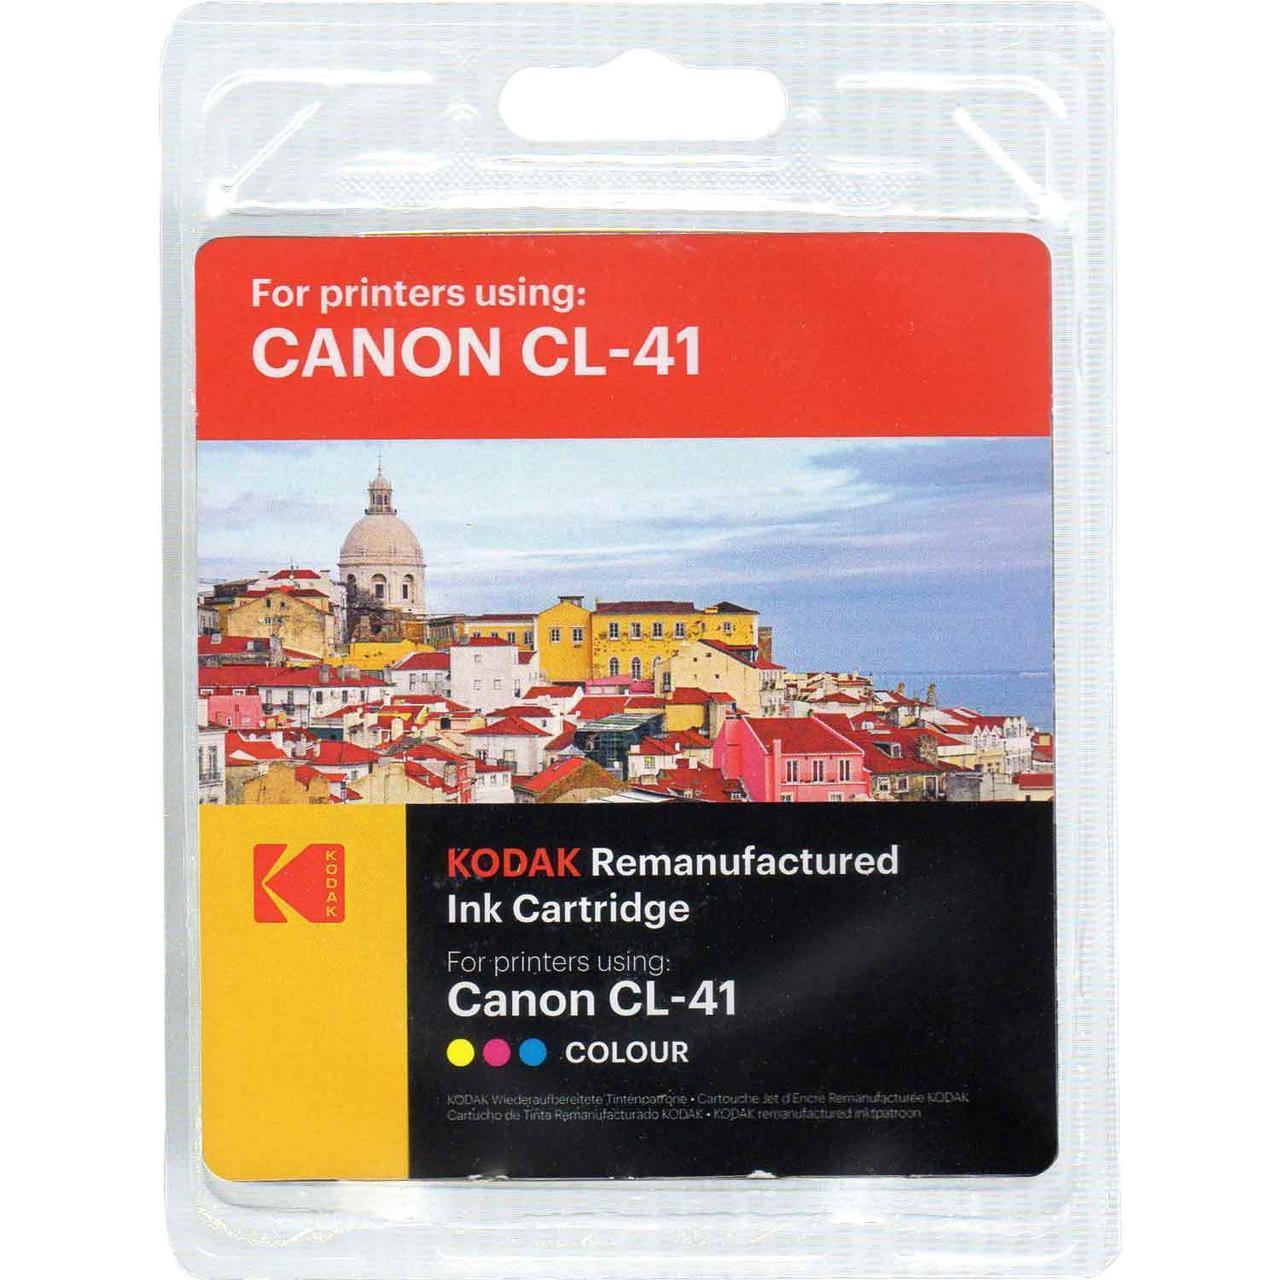 Картридж Canon CL-41, Color (Колір), iP1200/1300/1600/1700/1800/2200/2500/2600,